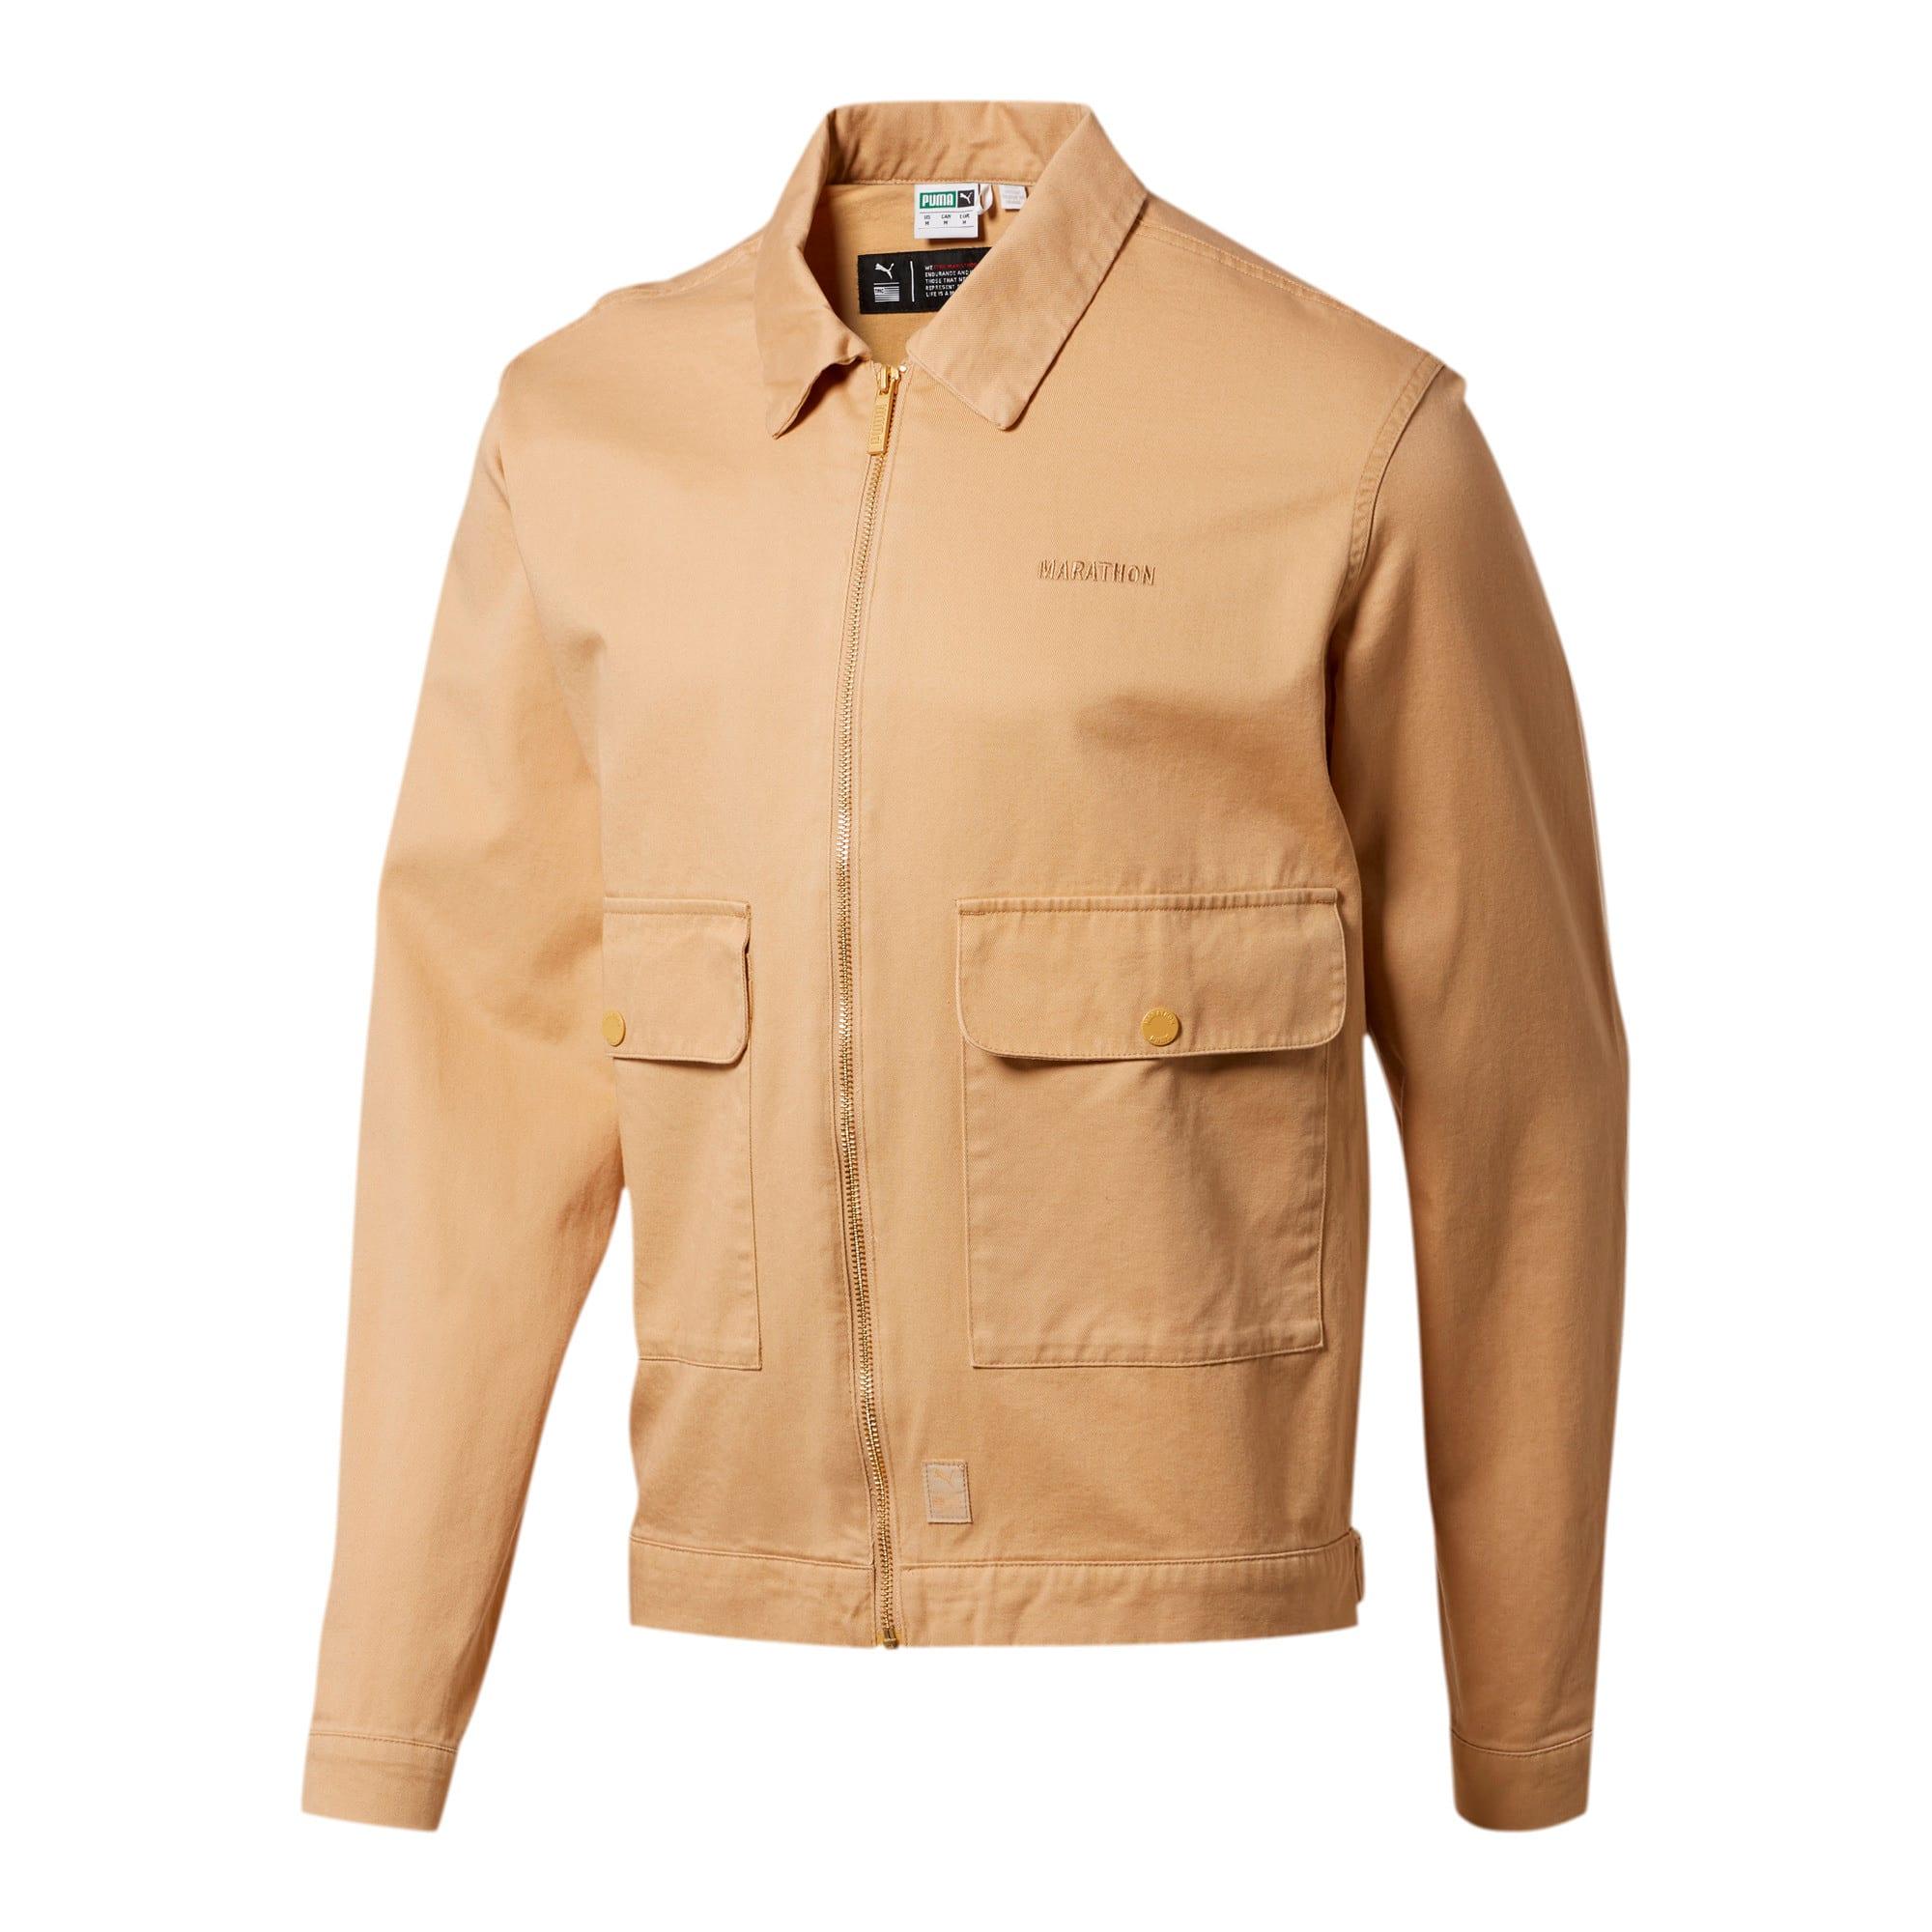 PUMA x TMC Hussle Men's Jacket